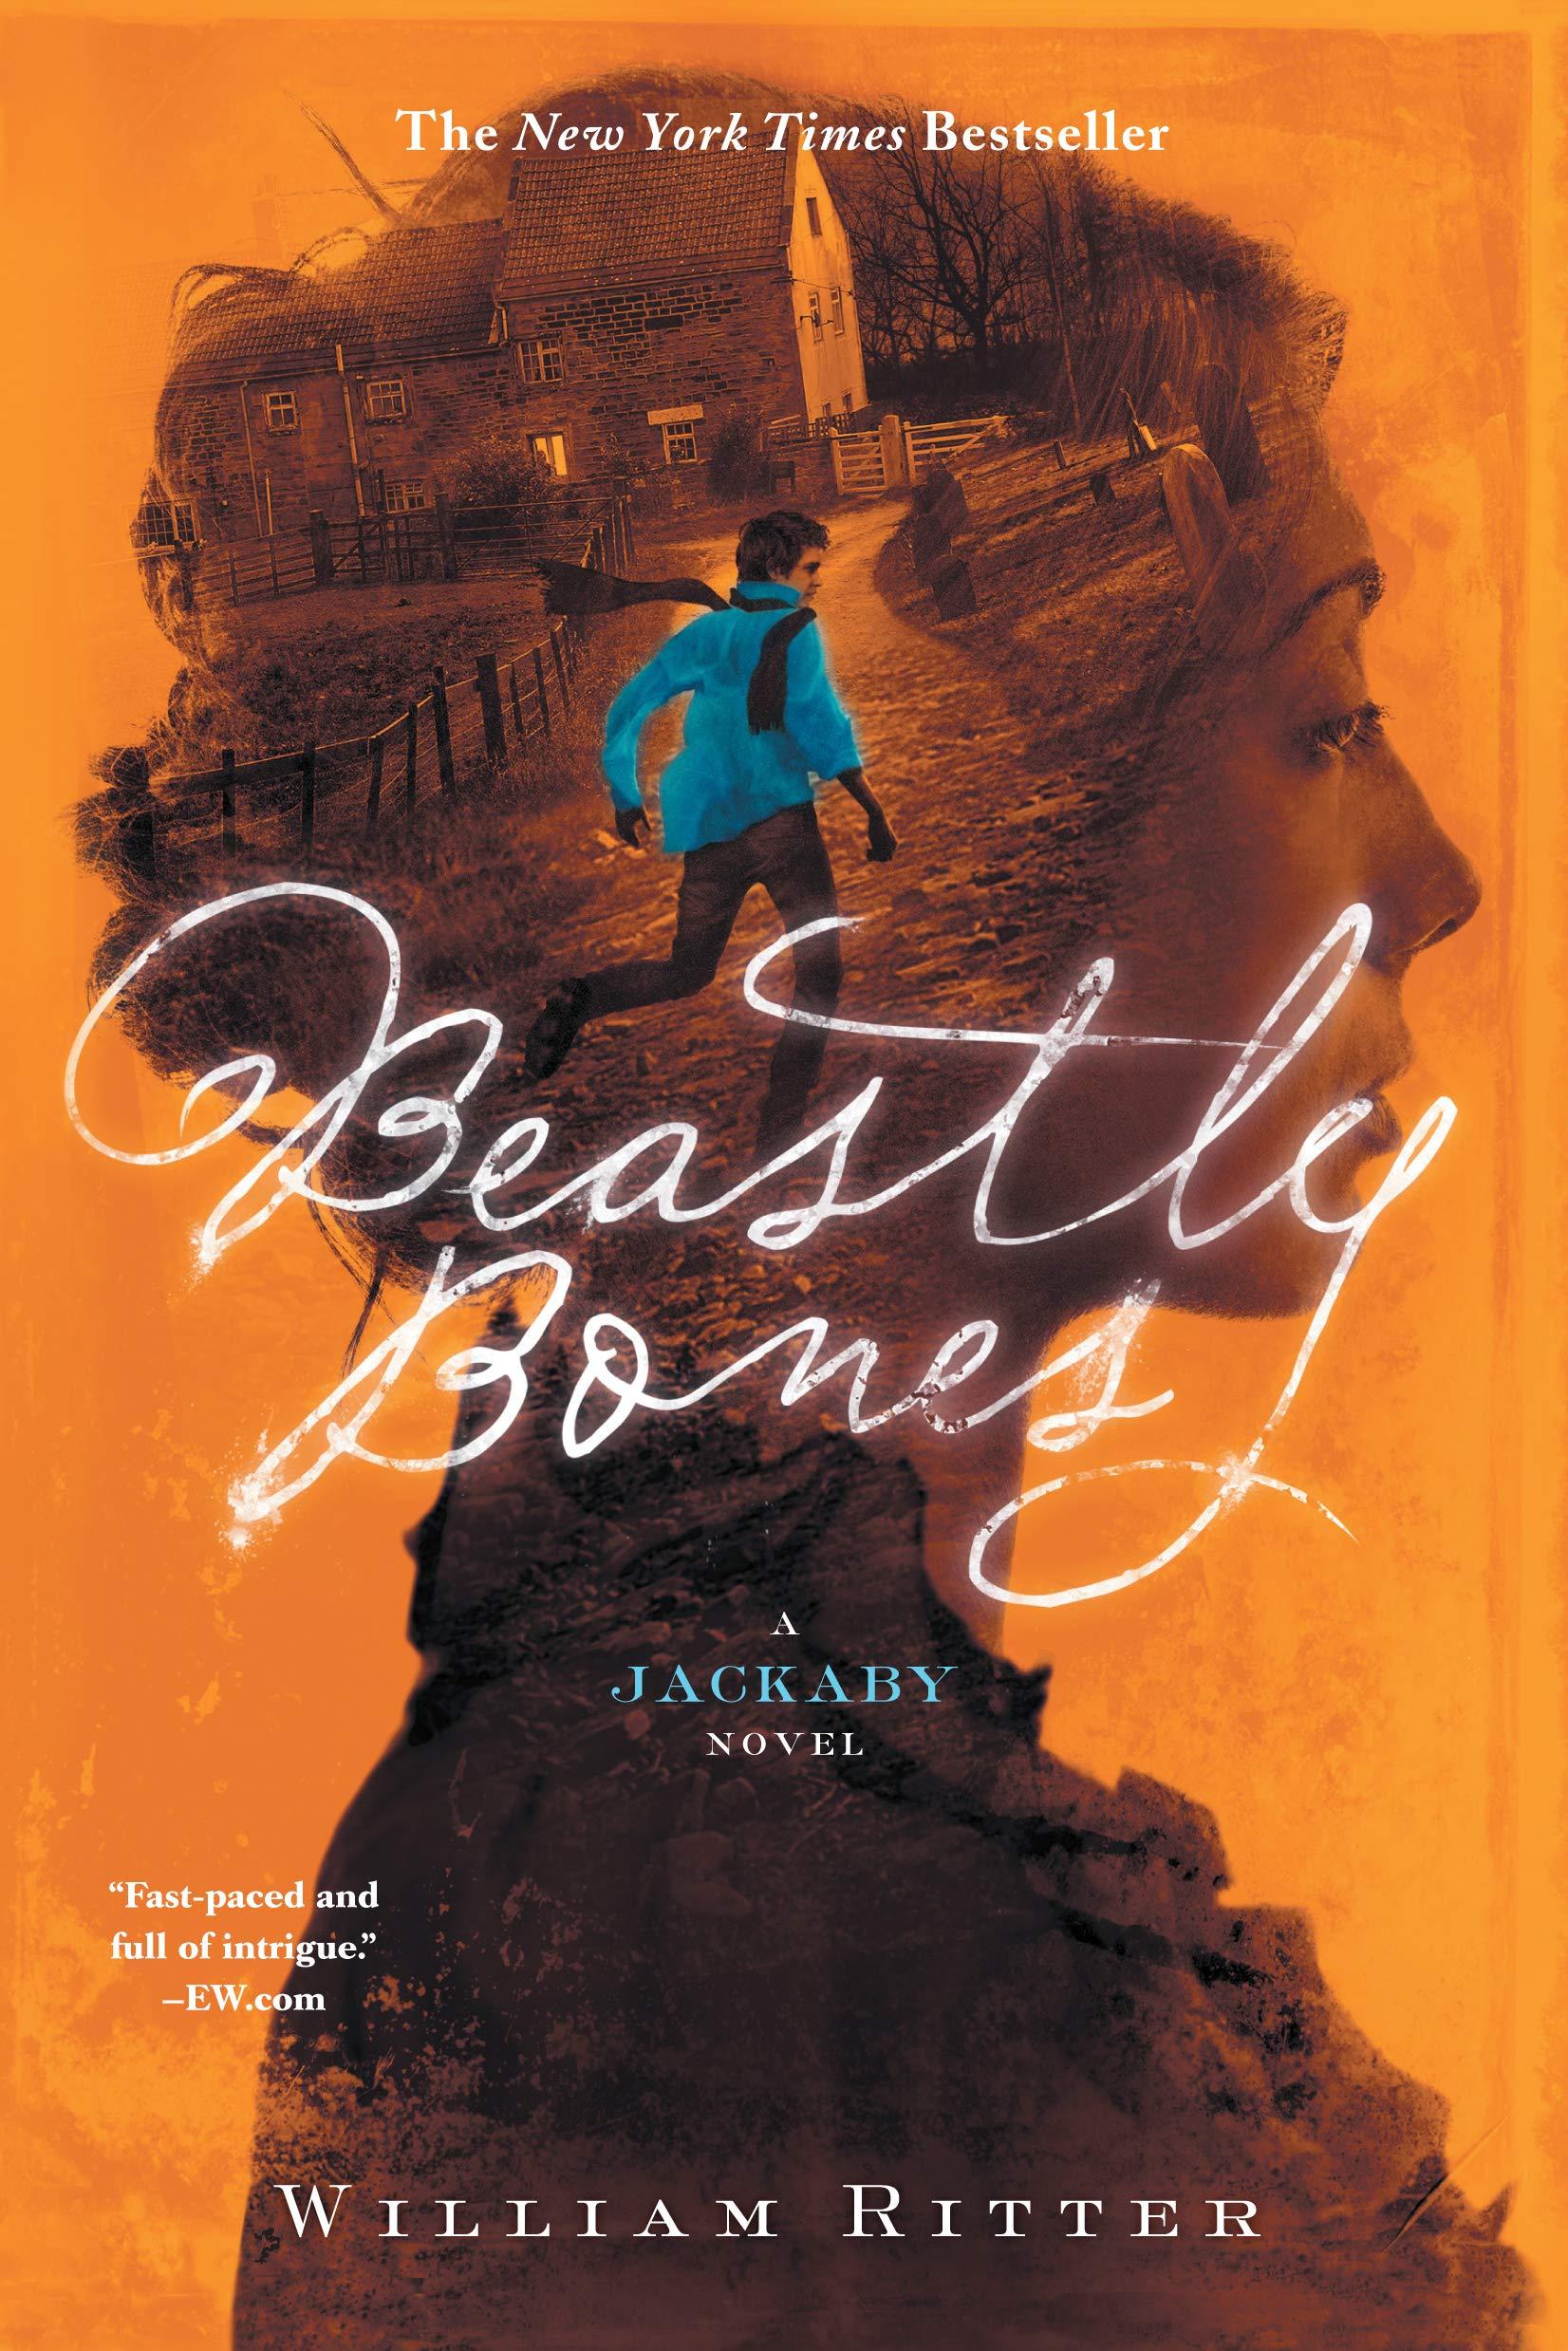 Beastly Bones: A Jackaby Novel 02 : Ritter, William: Amazon.de: Bücher